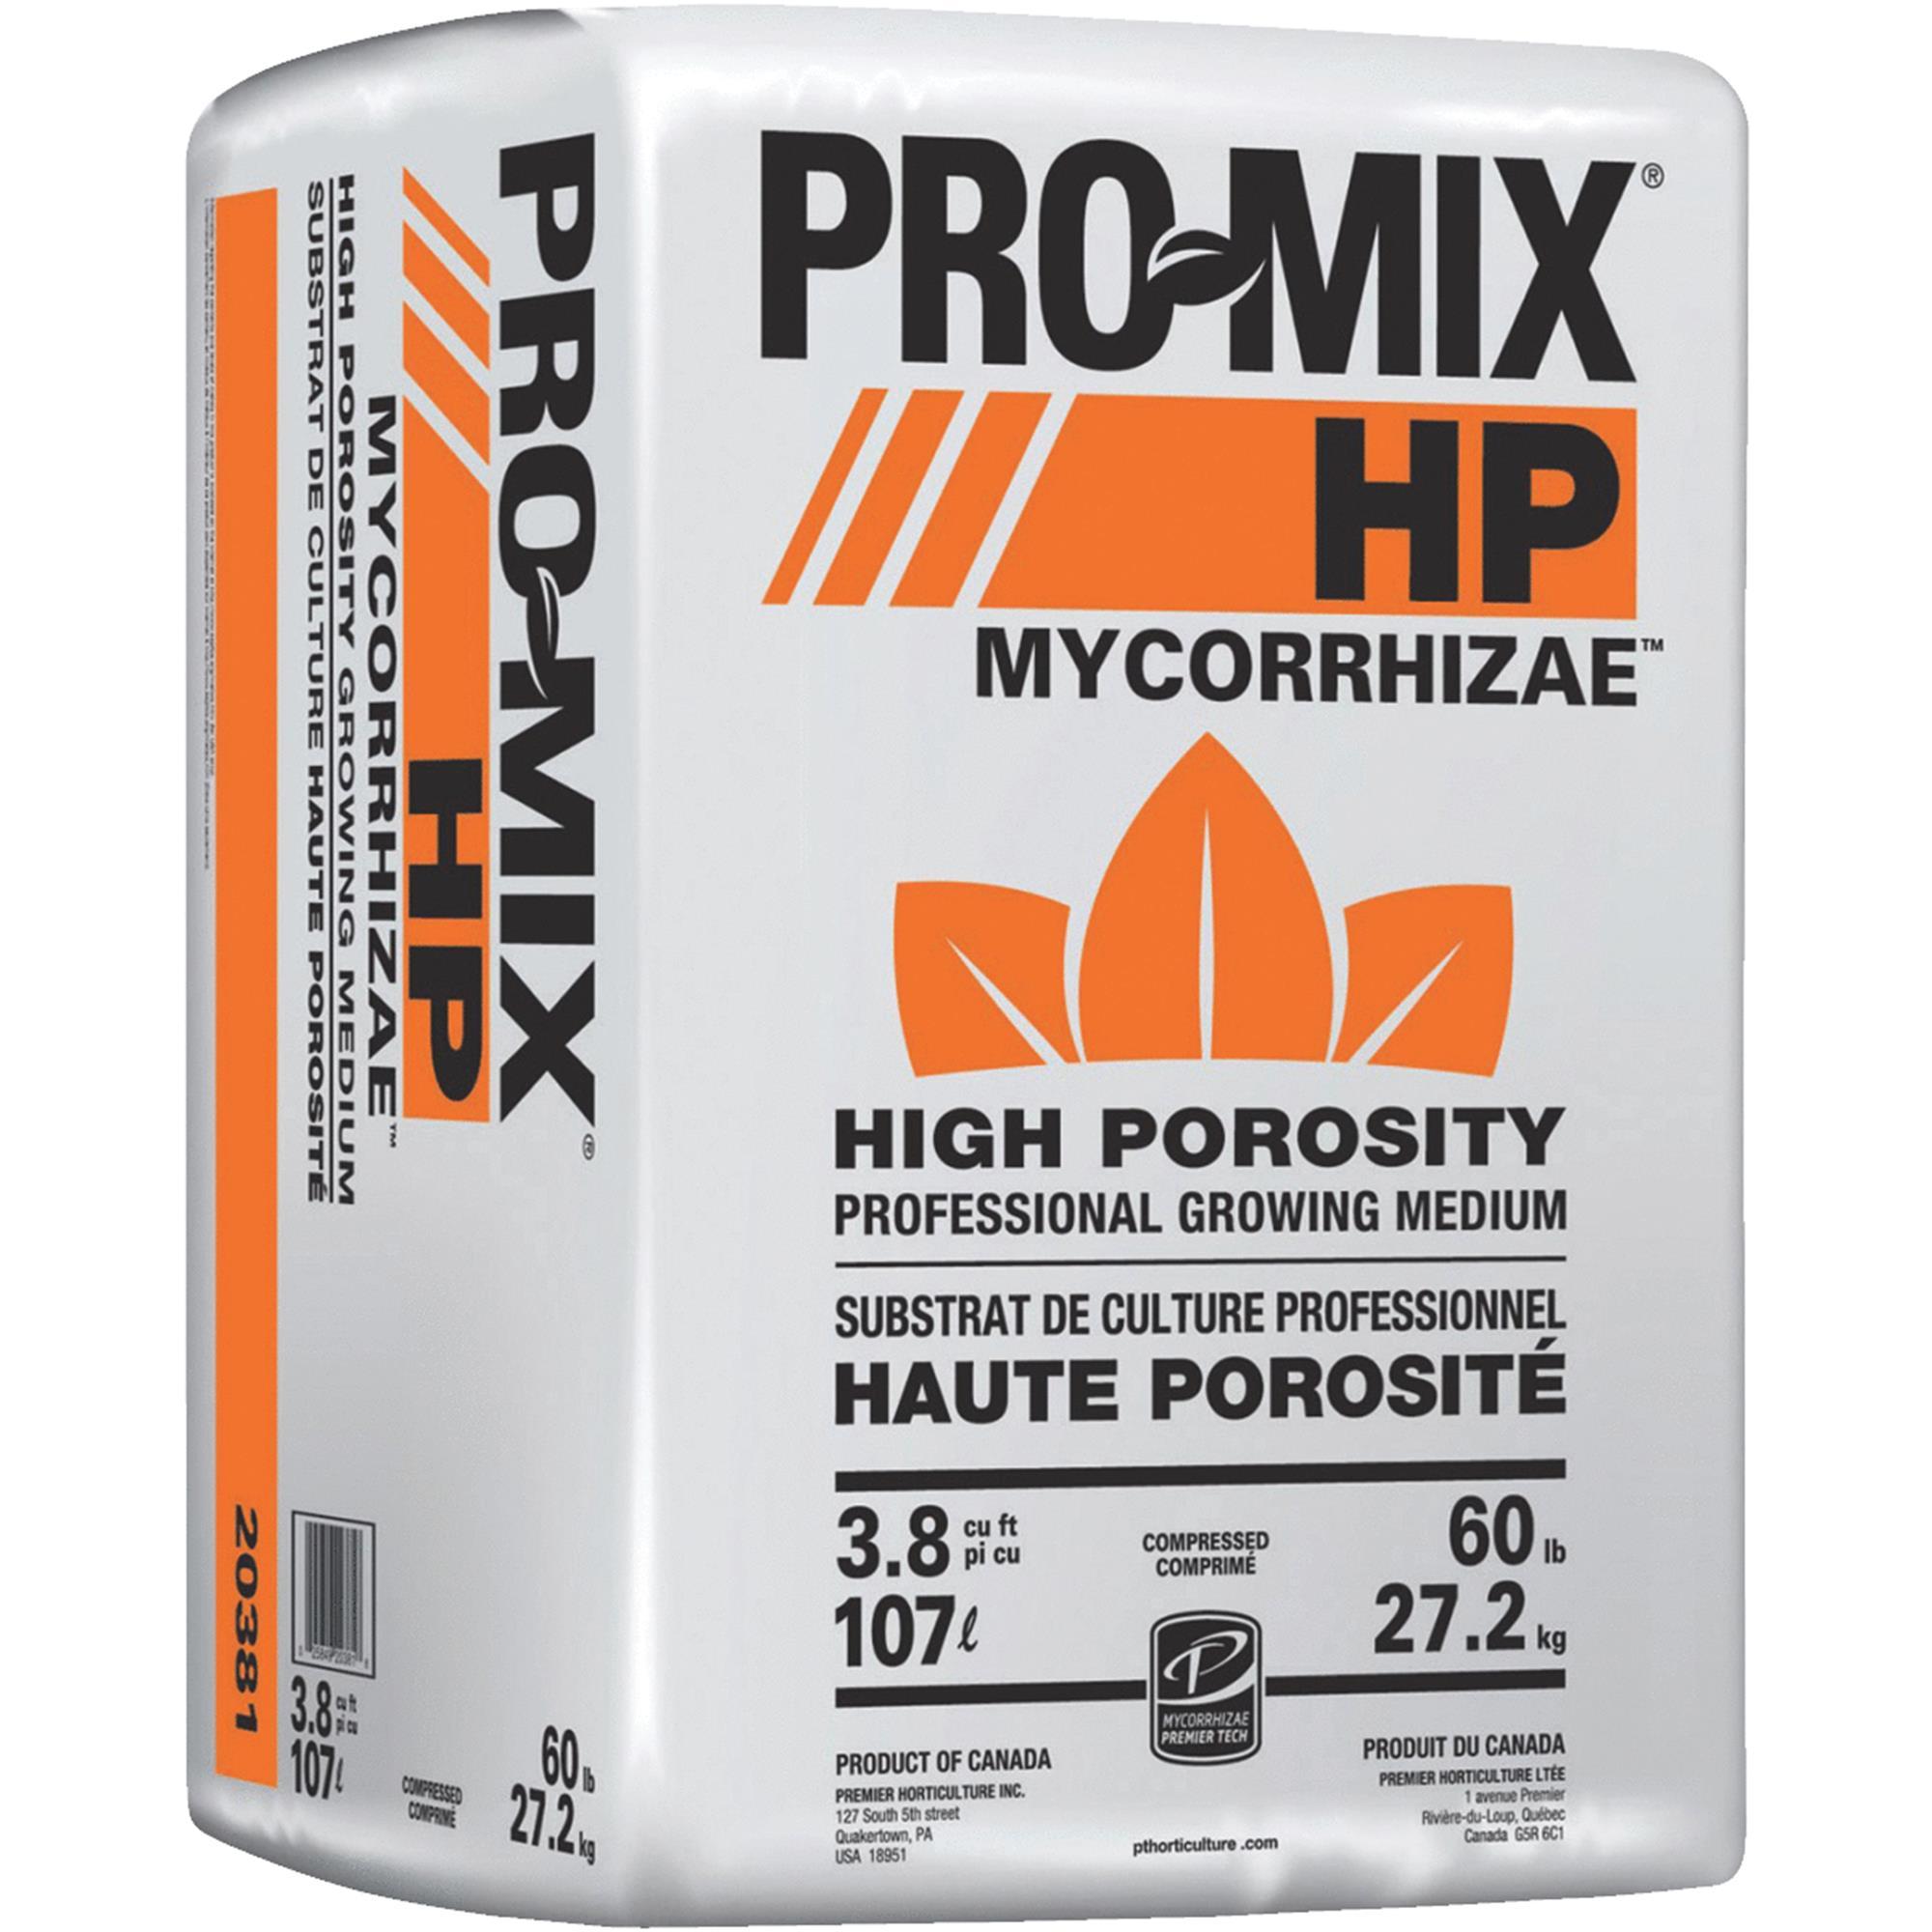 Premier PRO-MIX HP Mycorrhizae High Porosity Grower Mix, 3.8cu ft Compressed Bale